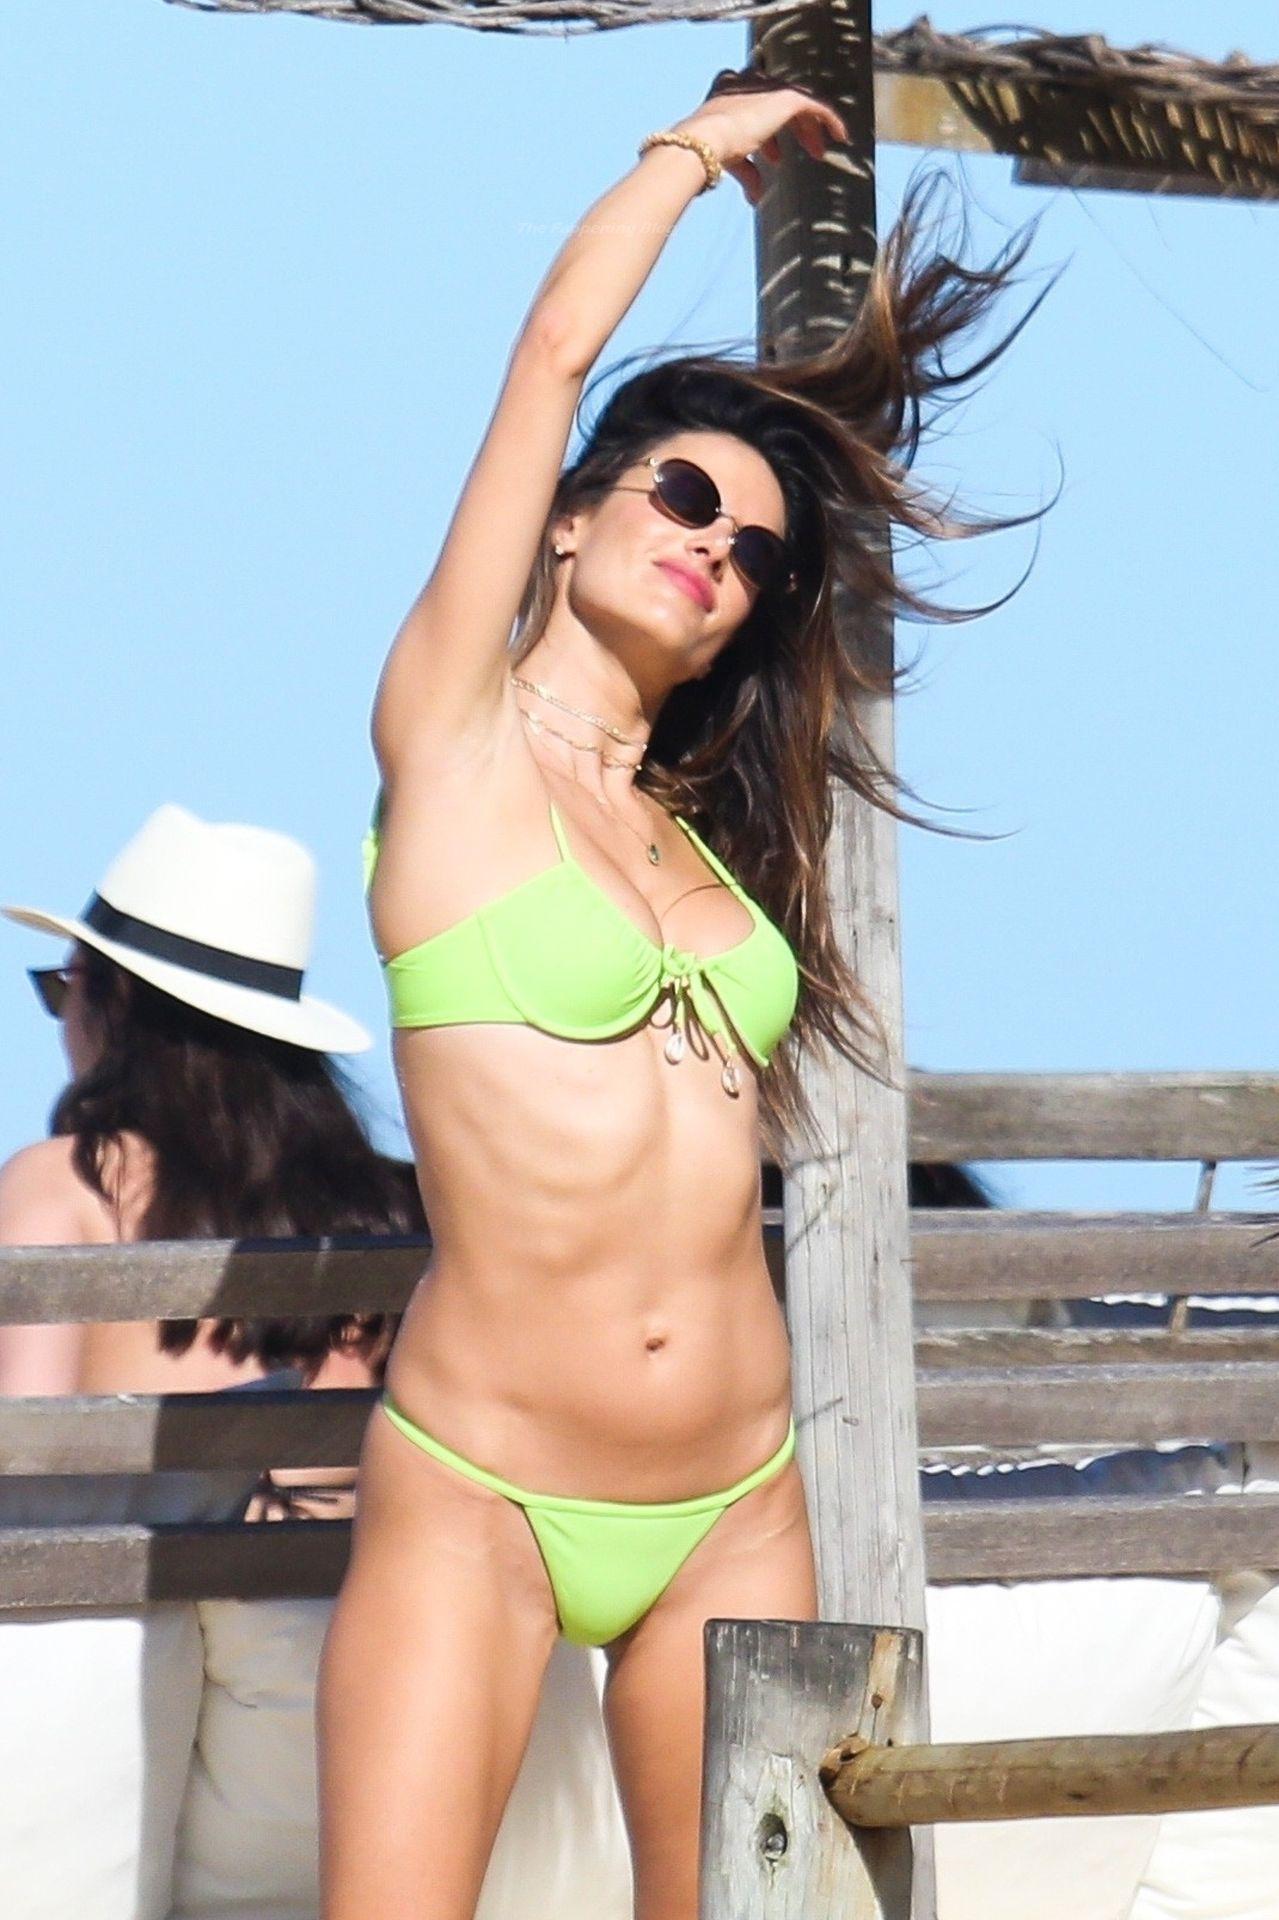 Alessandra-Ambrosio-Sexy-The-Fappening-Blog-701.jpg